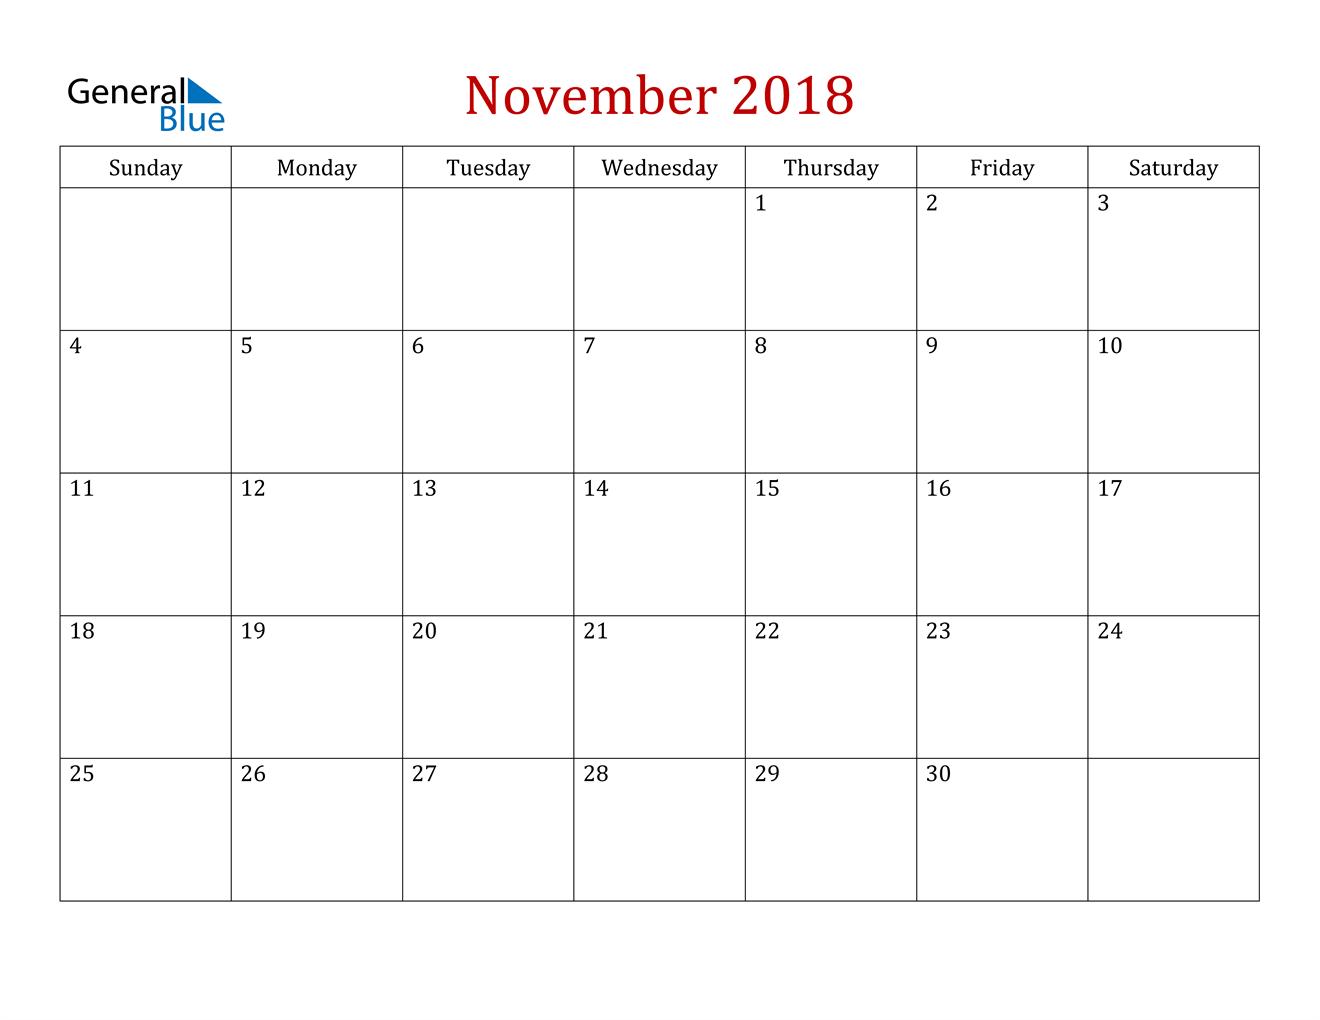 Image of November 2018 Dark and Red Professional Office Calendar Calendar